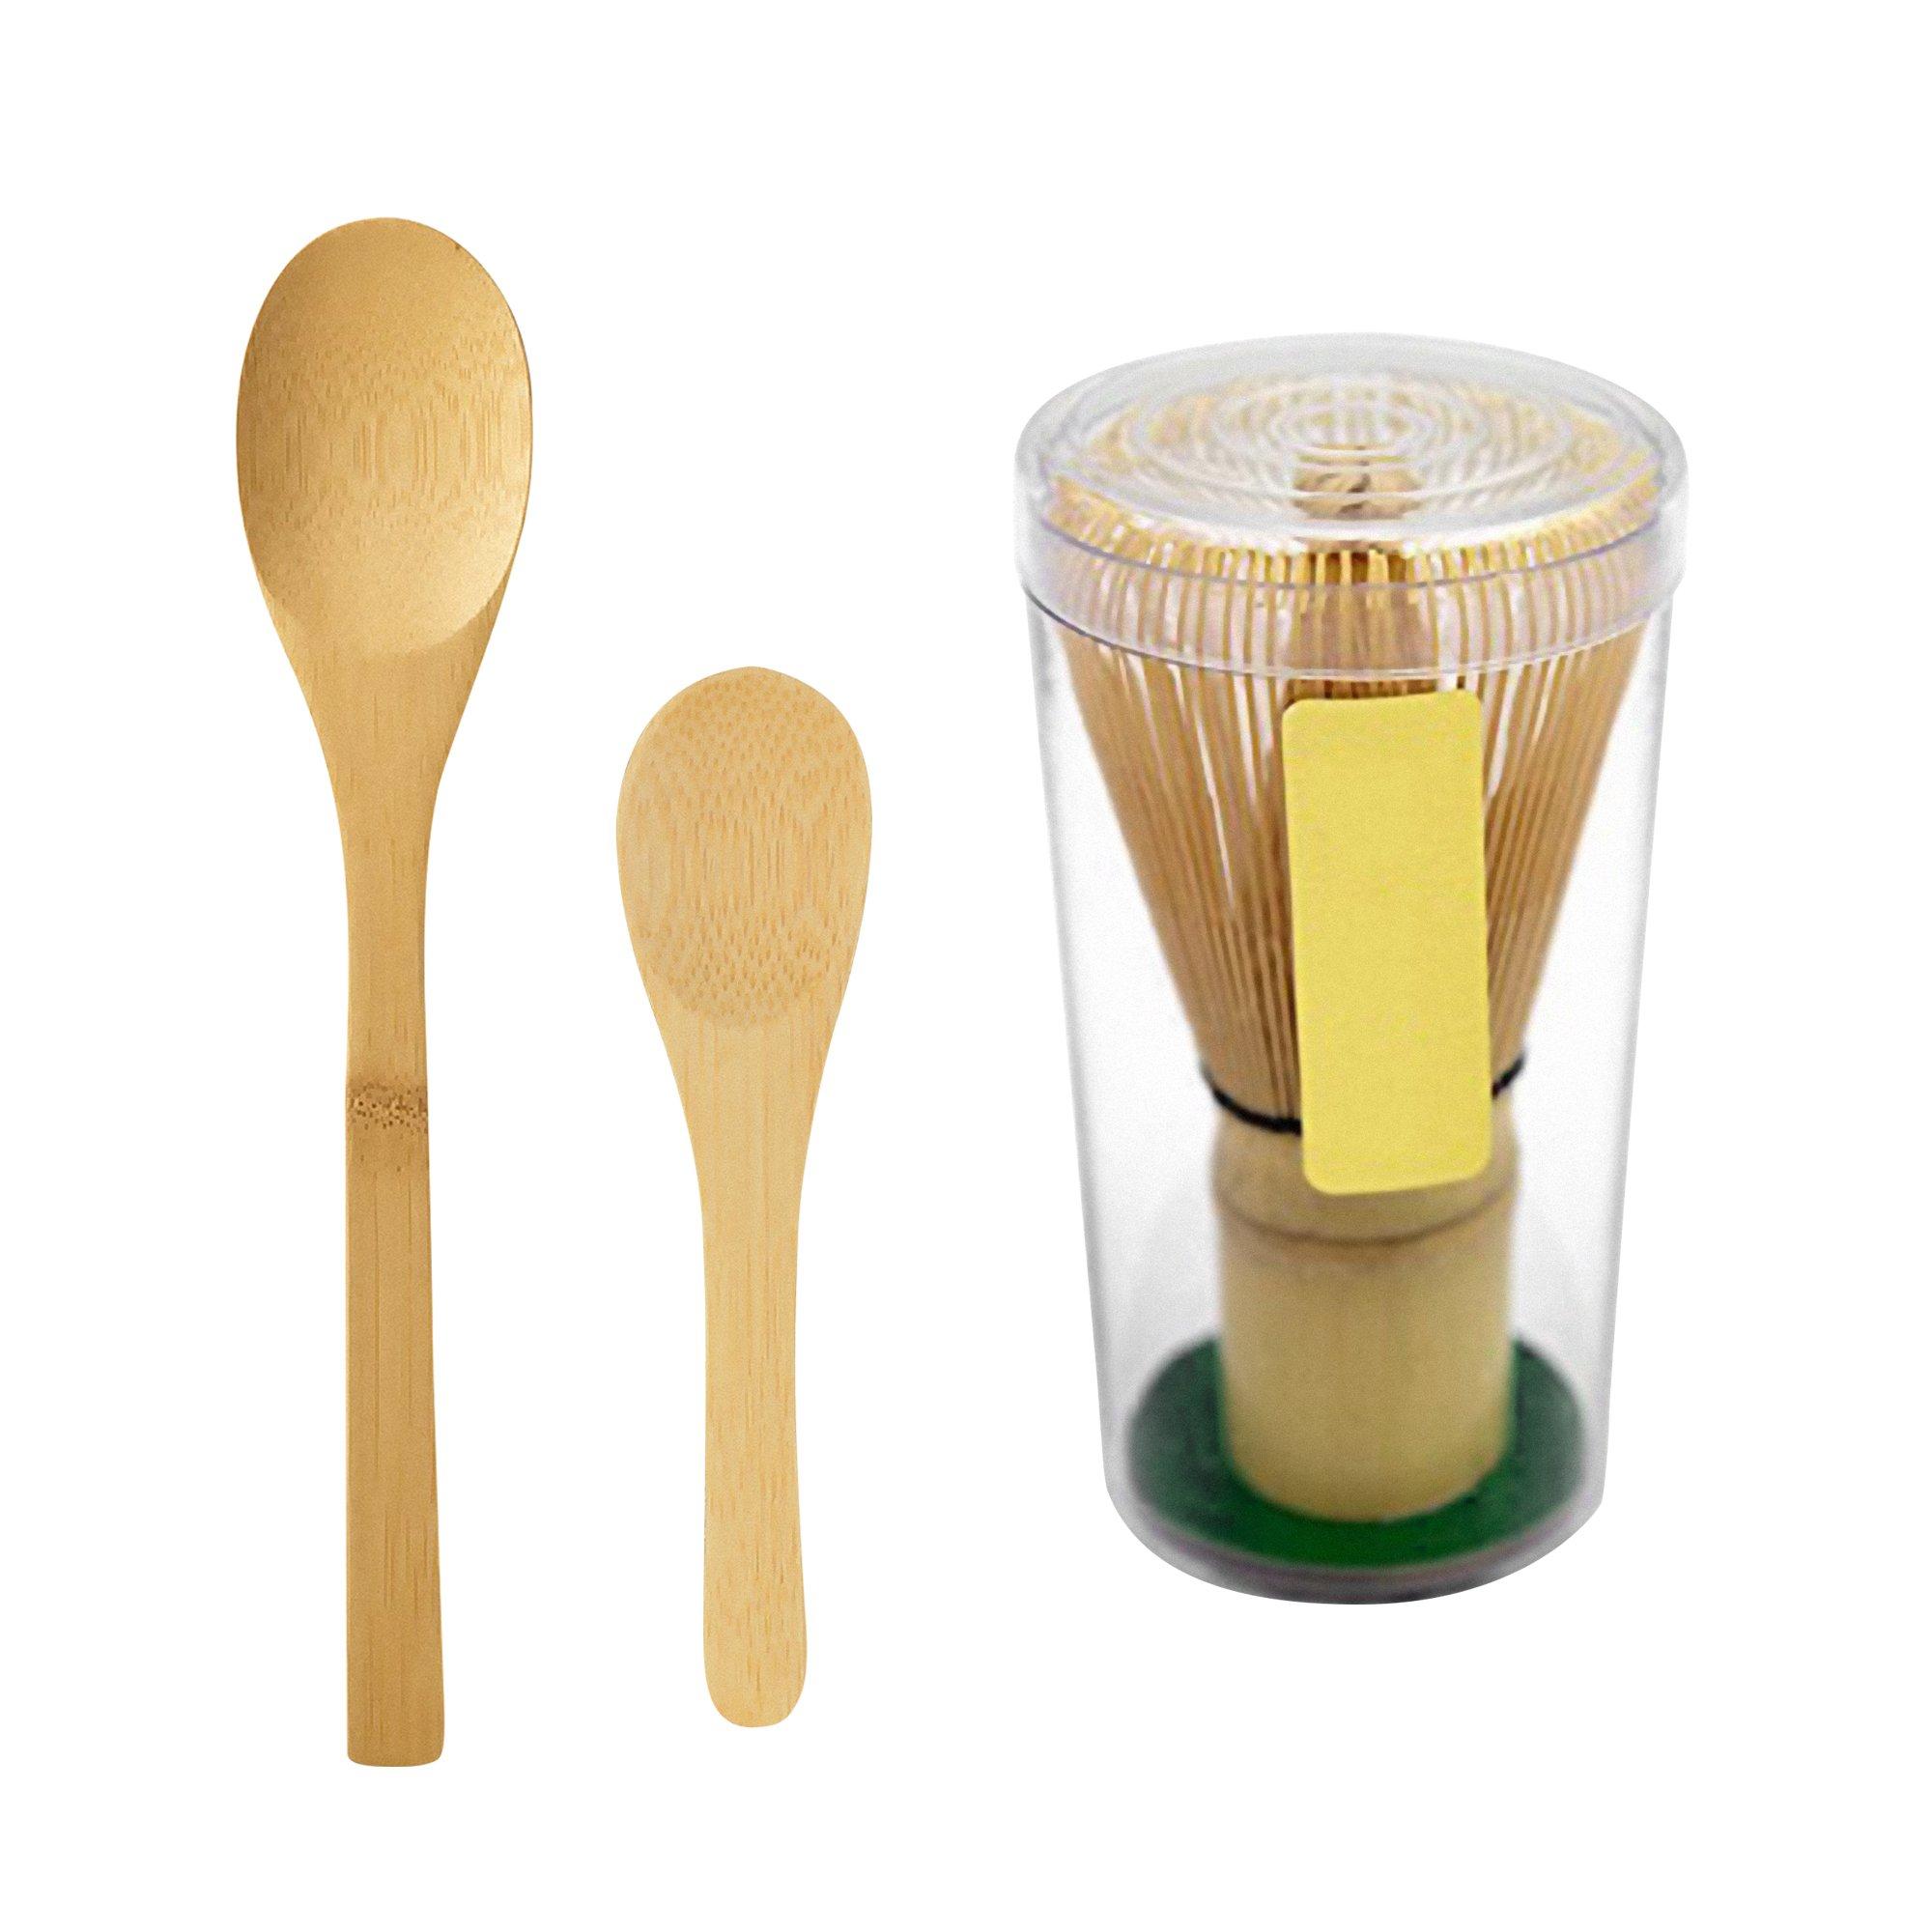 Premier Quality Natural Bamboo Matcha Tea Whisk w/ Japanese Green Tea Stirrer Spoon Set